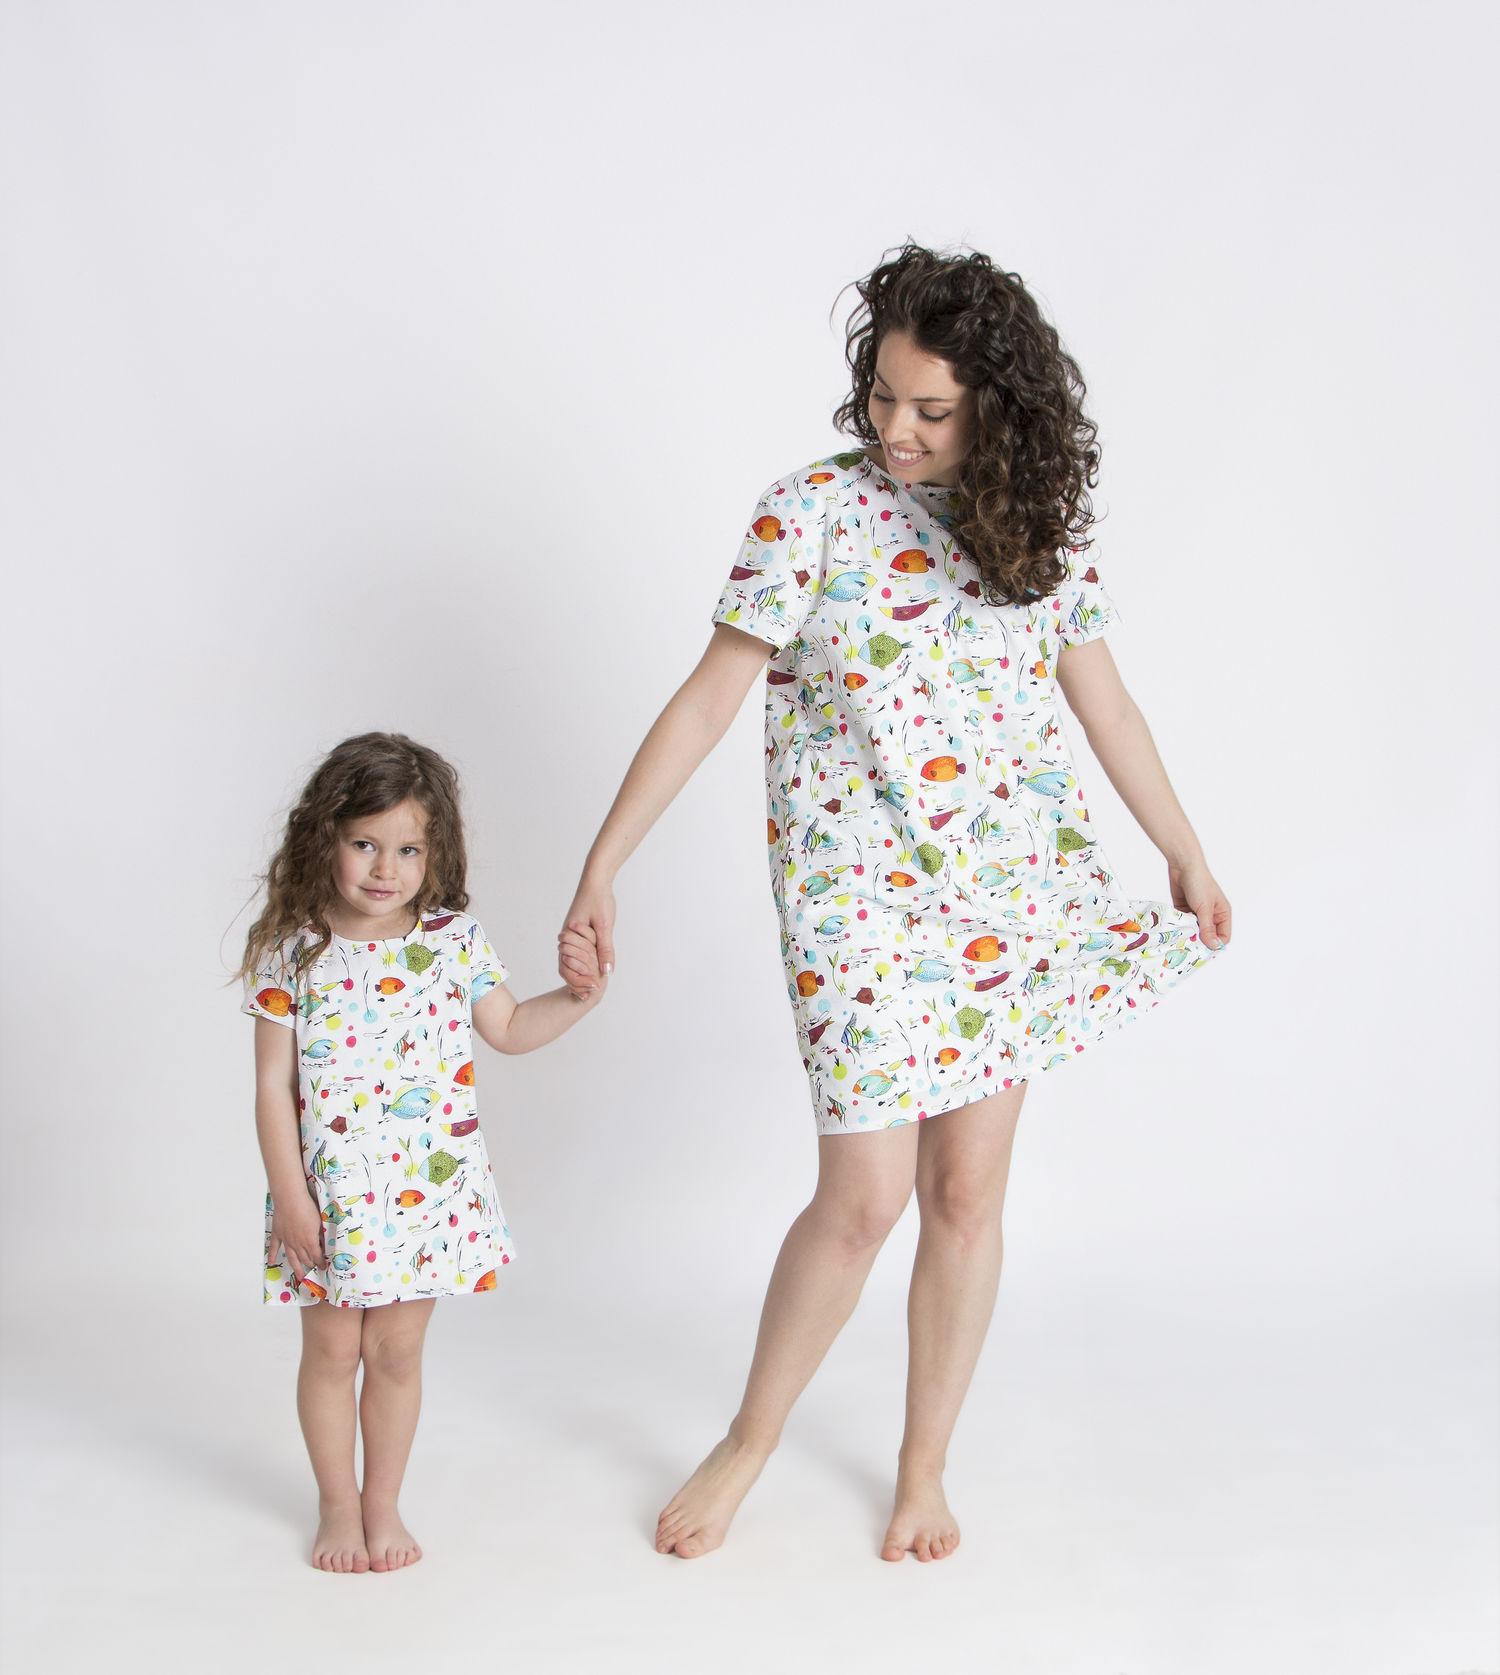 madre e hija iguales_vestido_peces.jpg